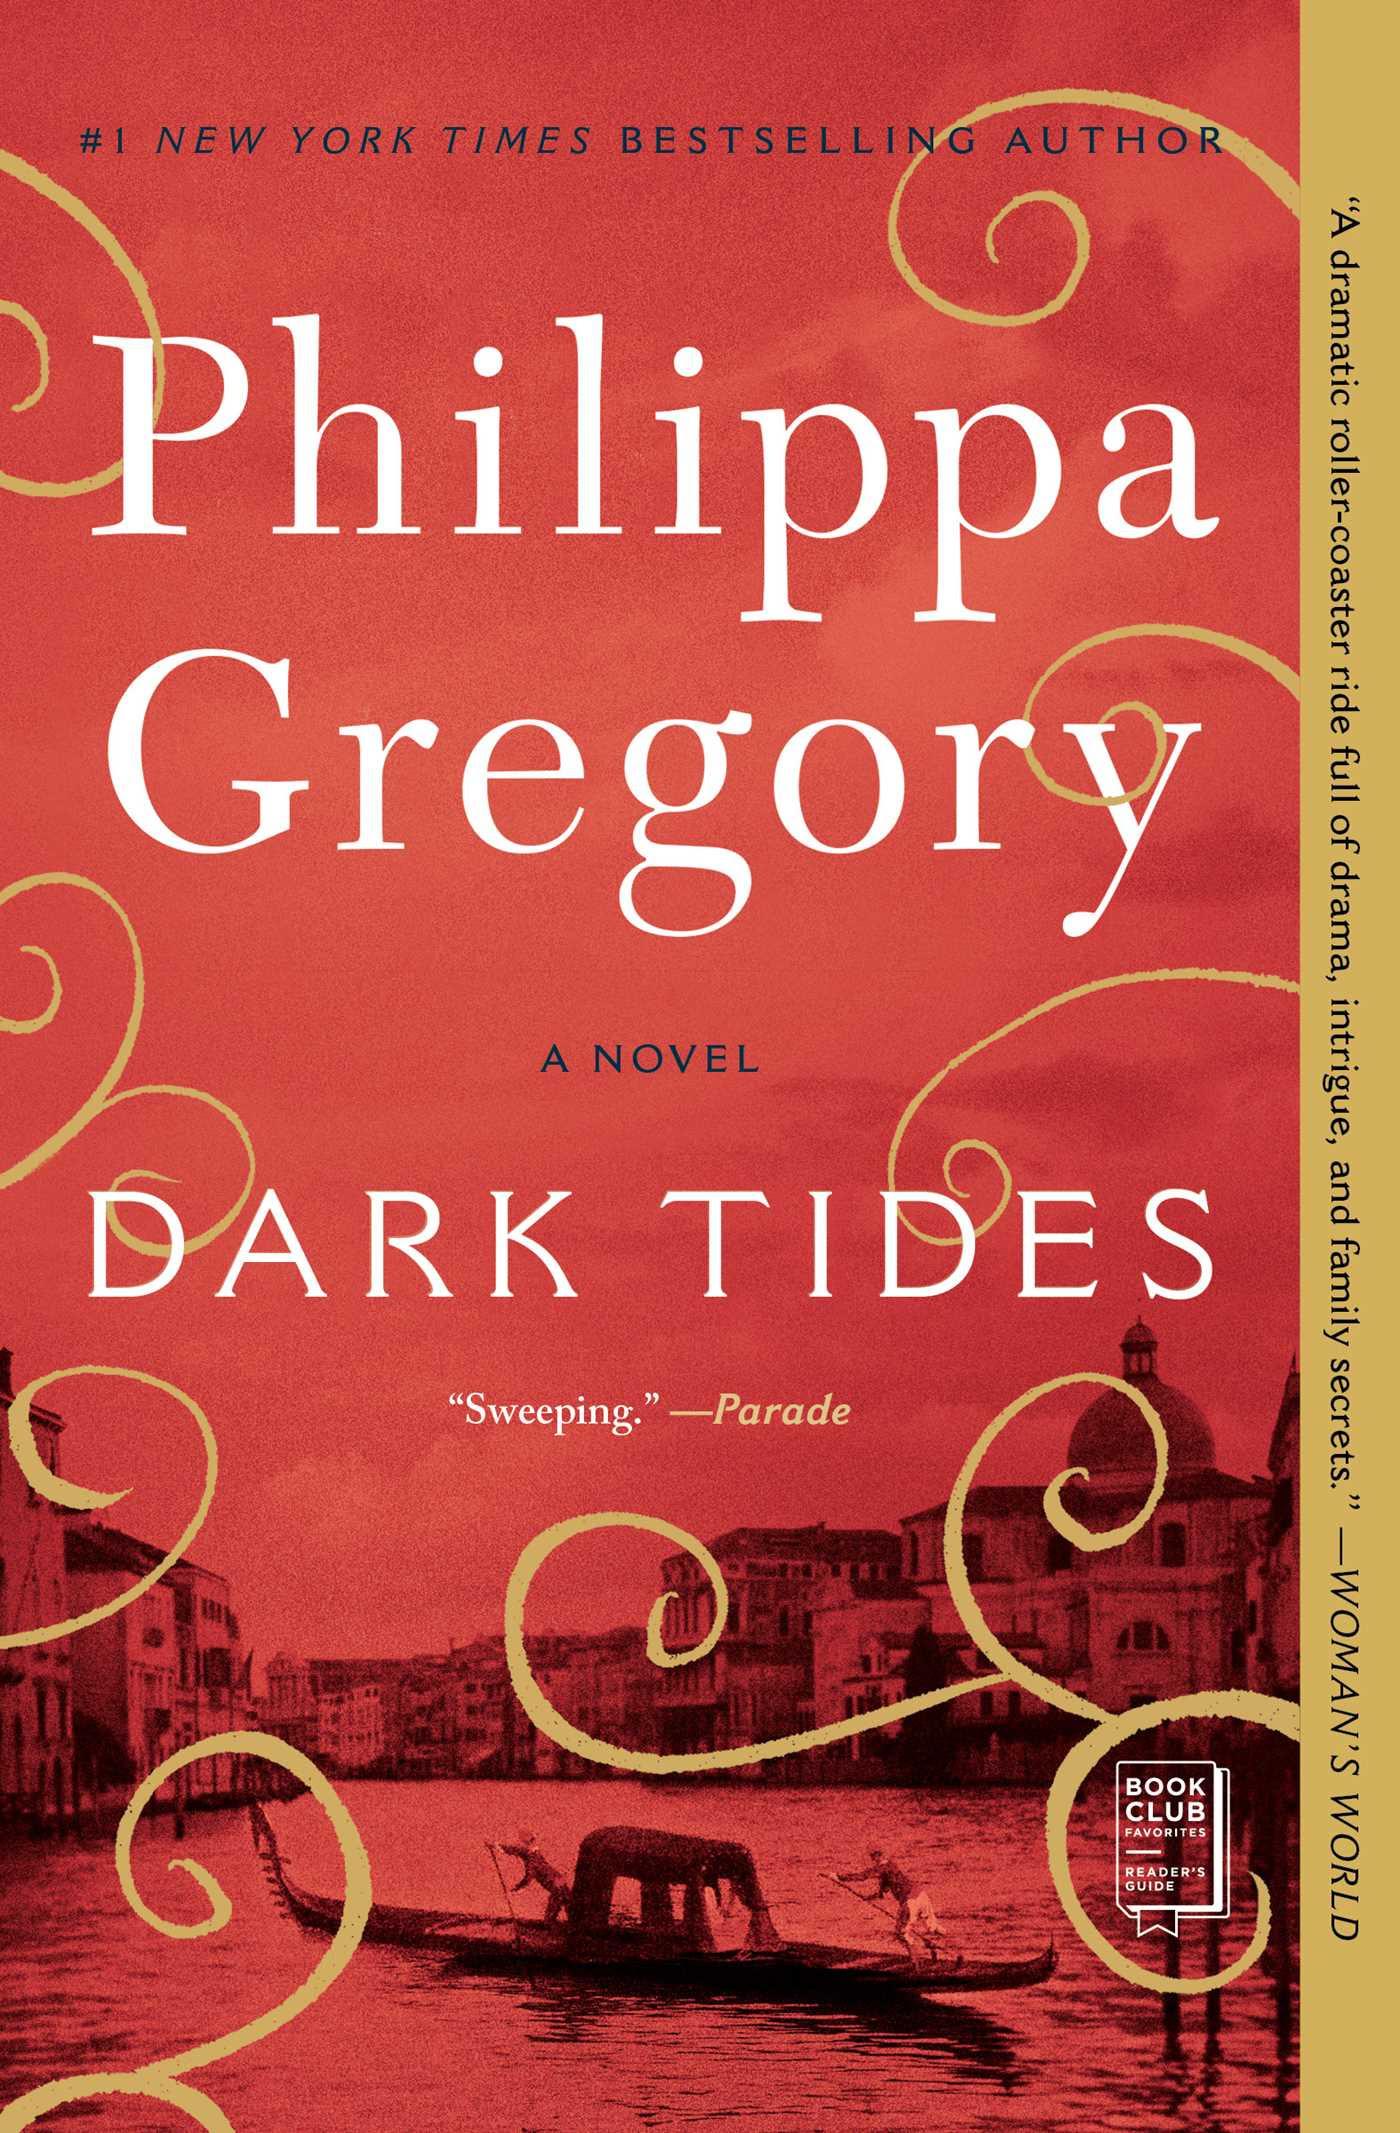 ✔️ Download Dark Tides - Philippa Gregory PDF ✔️ Free pdf download ✔️ Ebook ✔️ Epub